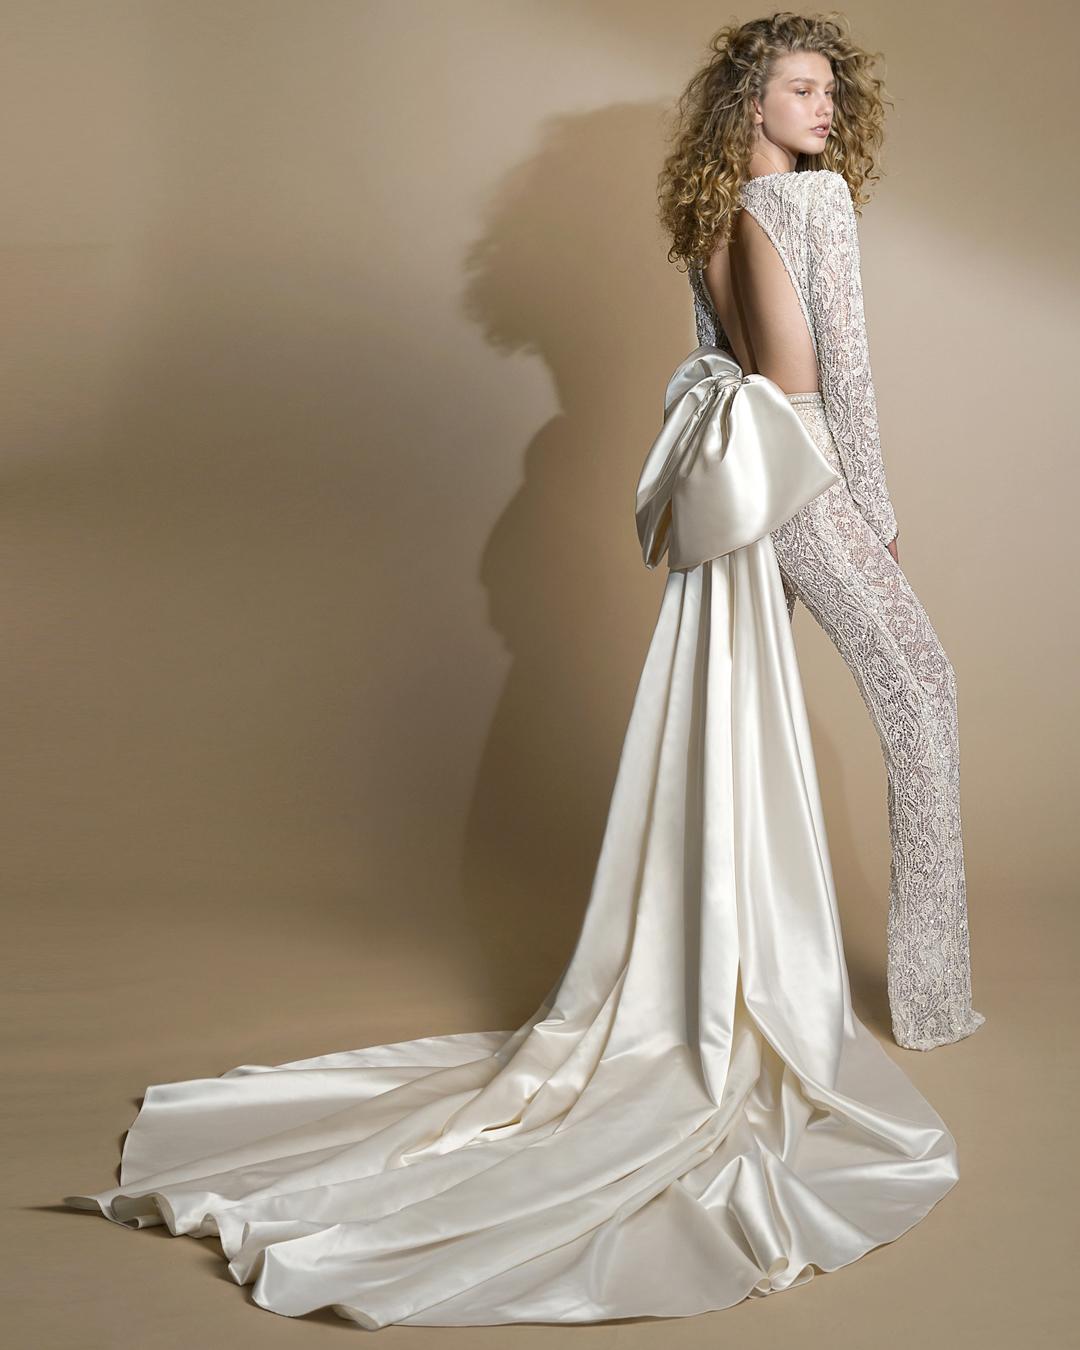 galia lahav gala wedding dress spring 2019 back lace pant suit satin bow train